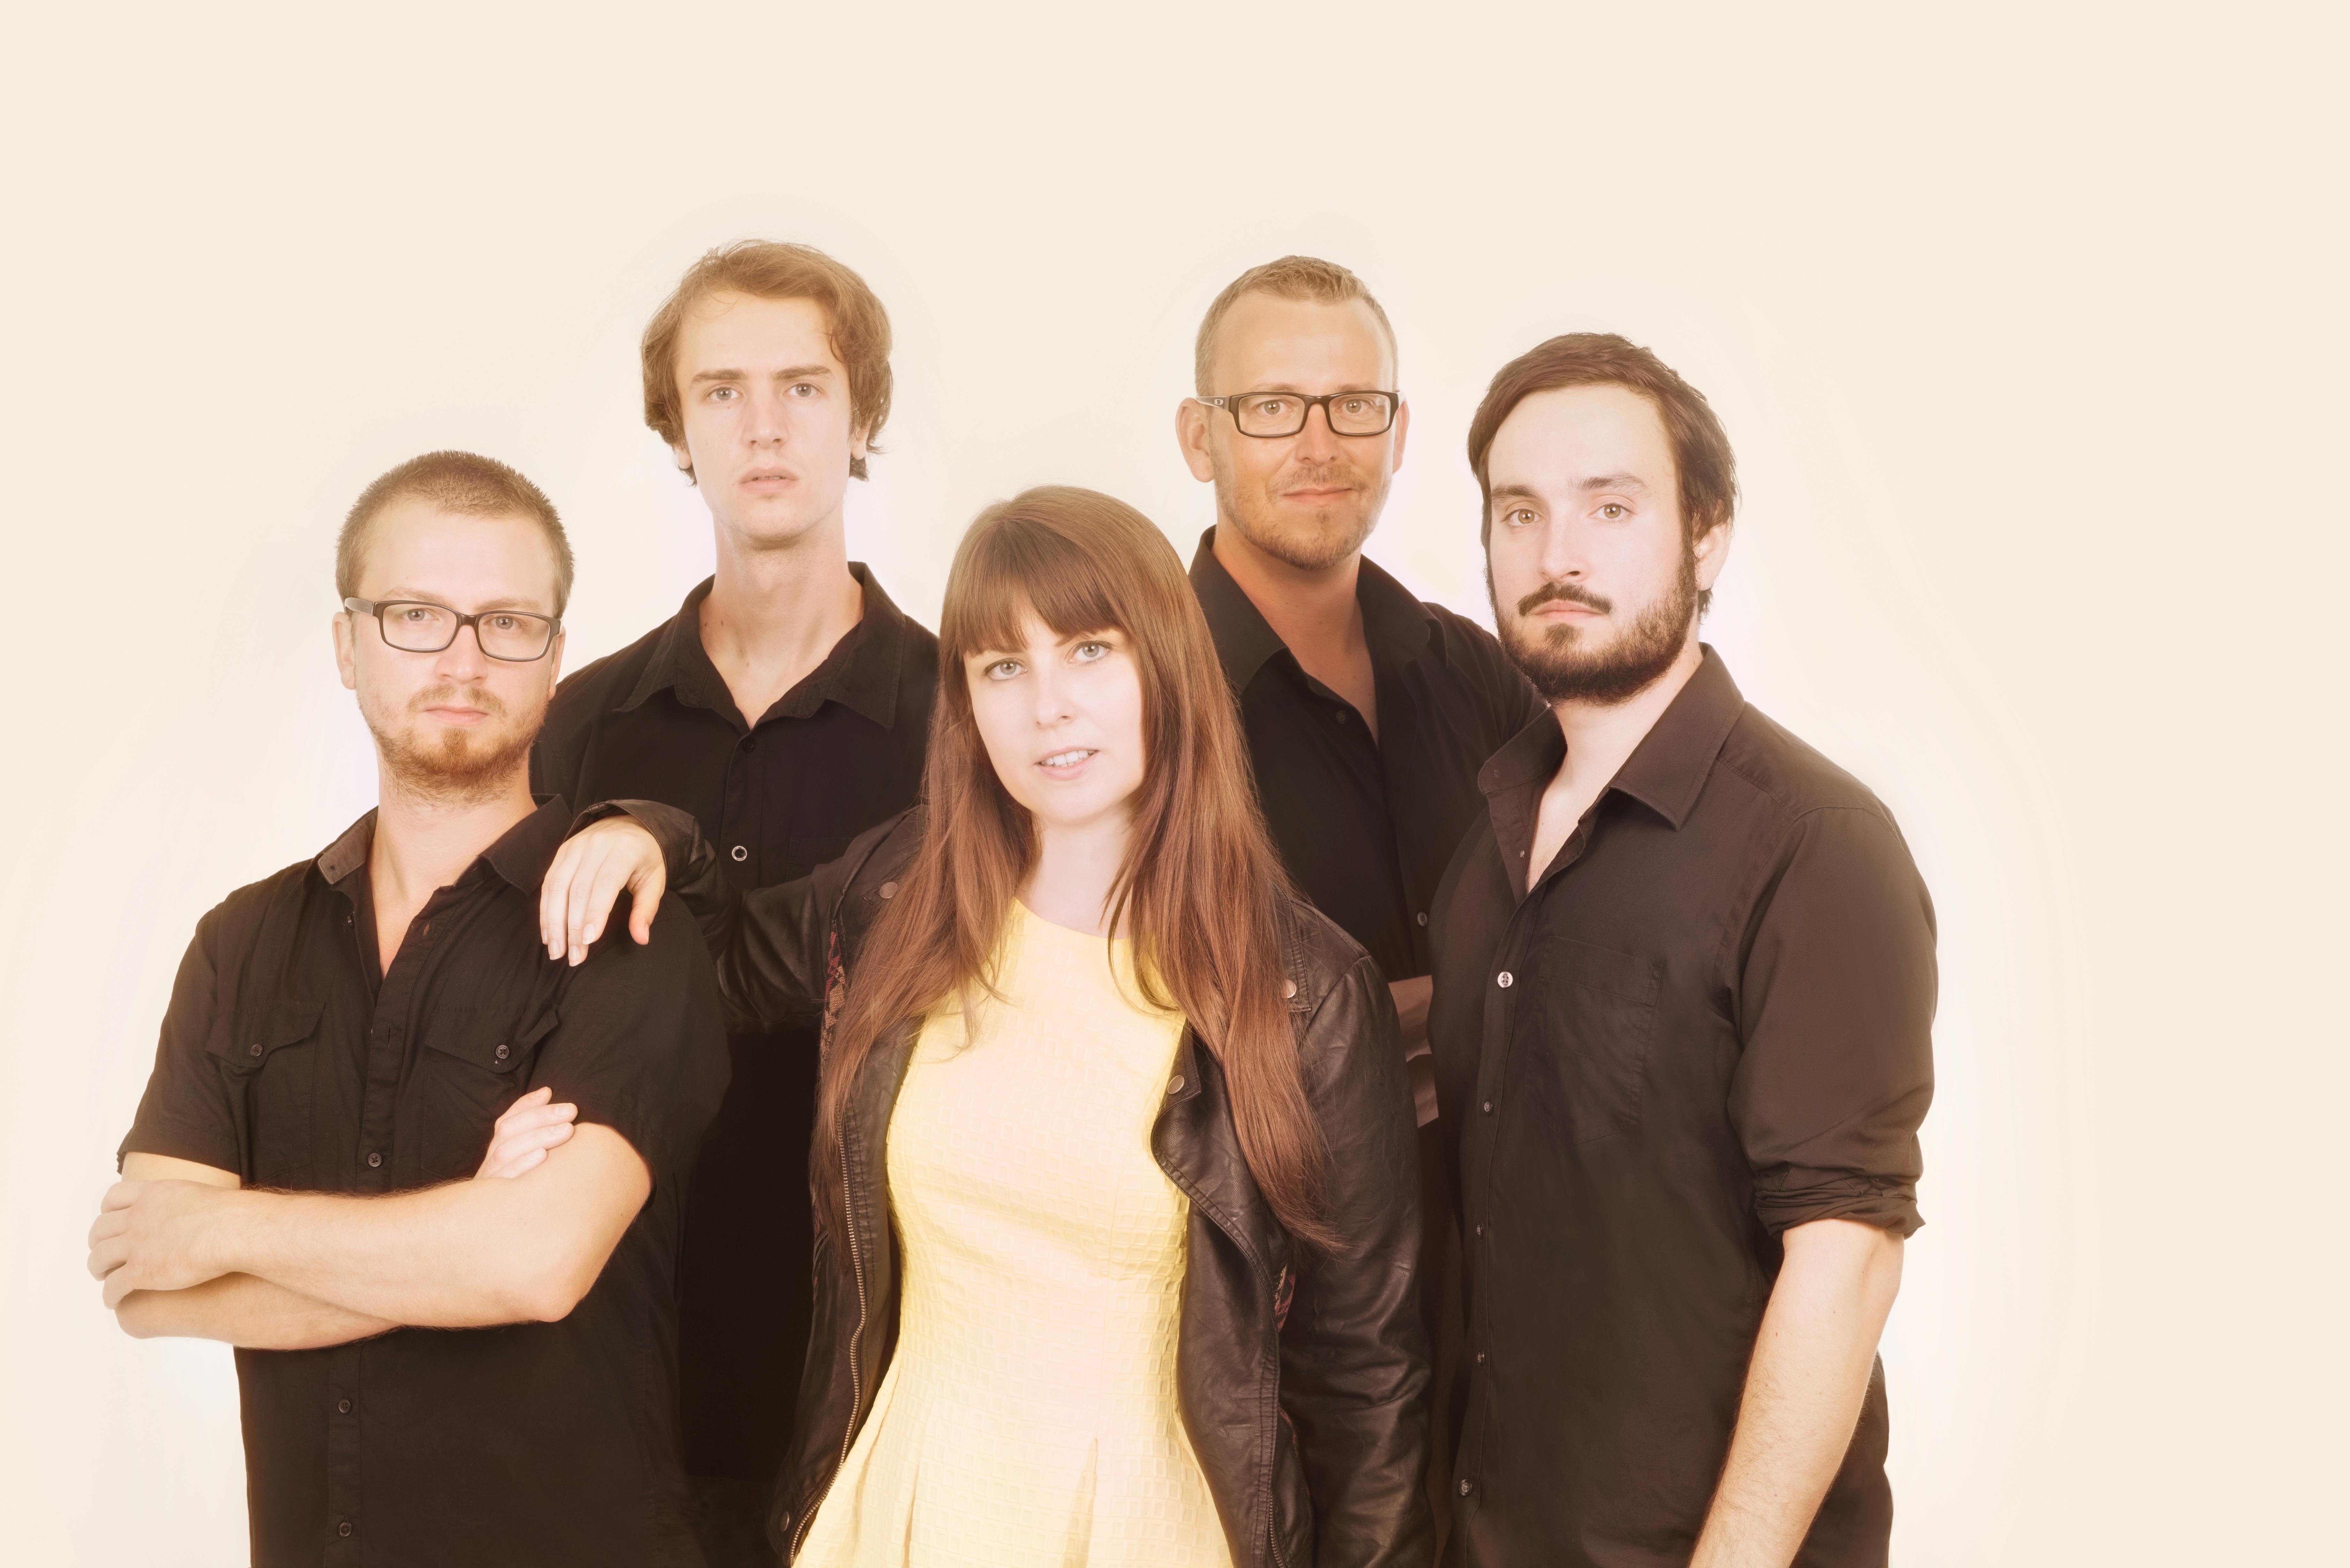 LikA_Band